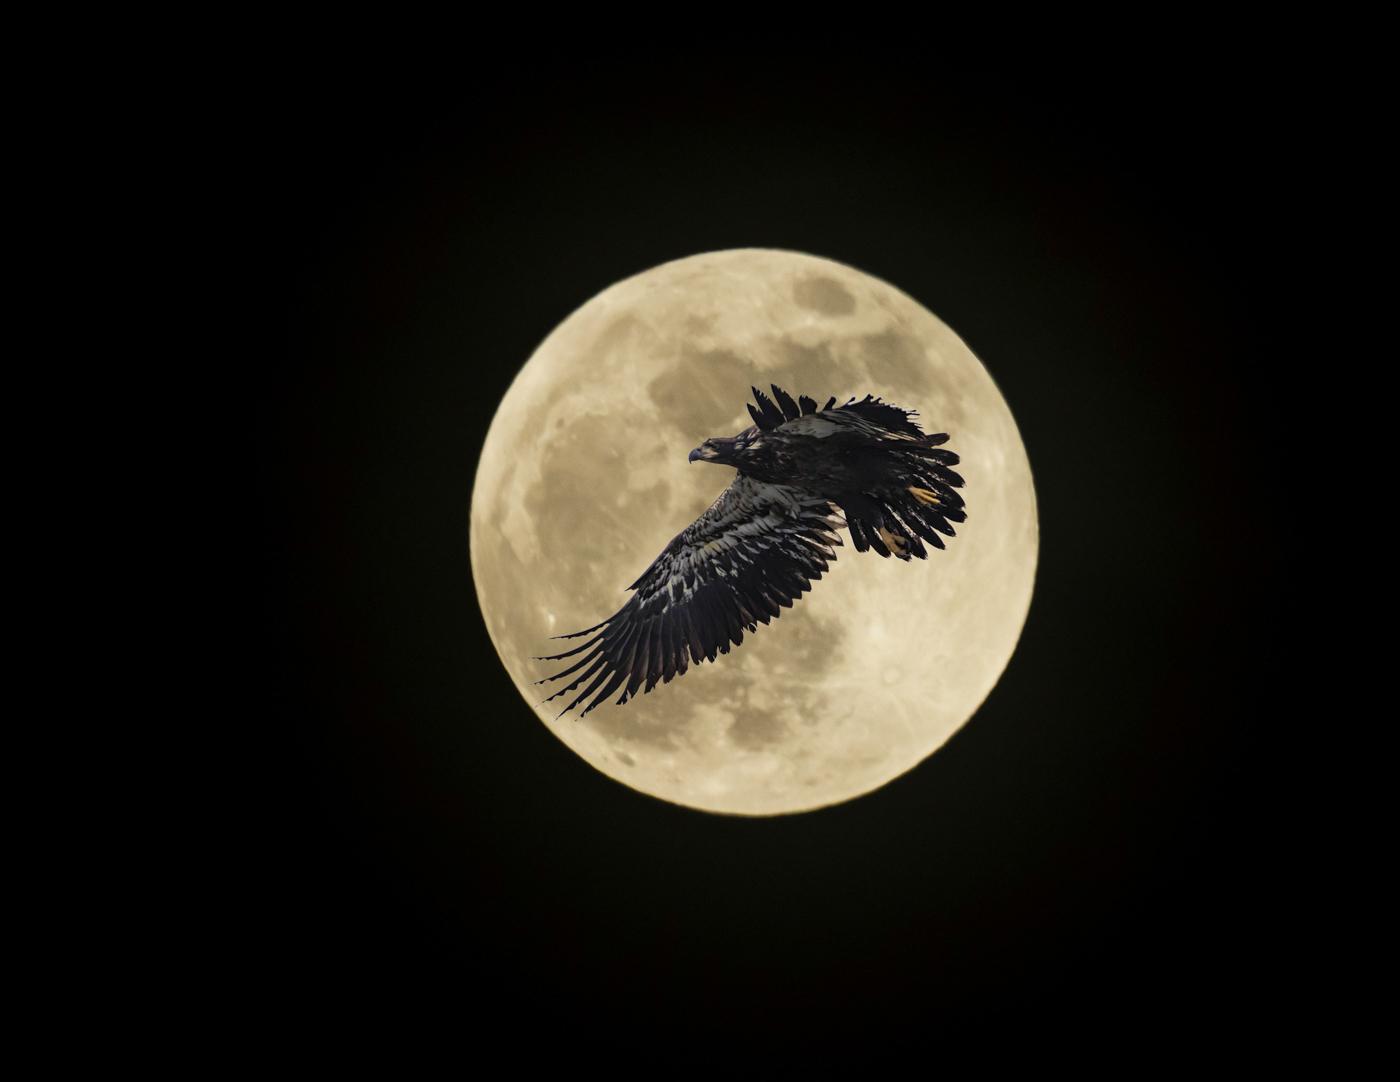 Moon and Eagle